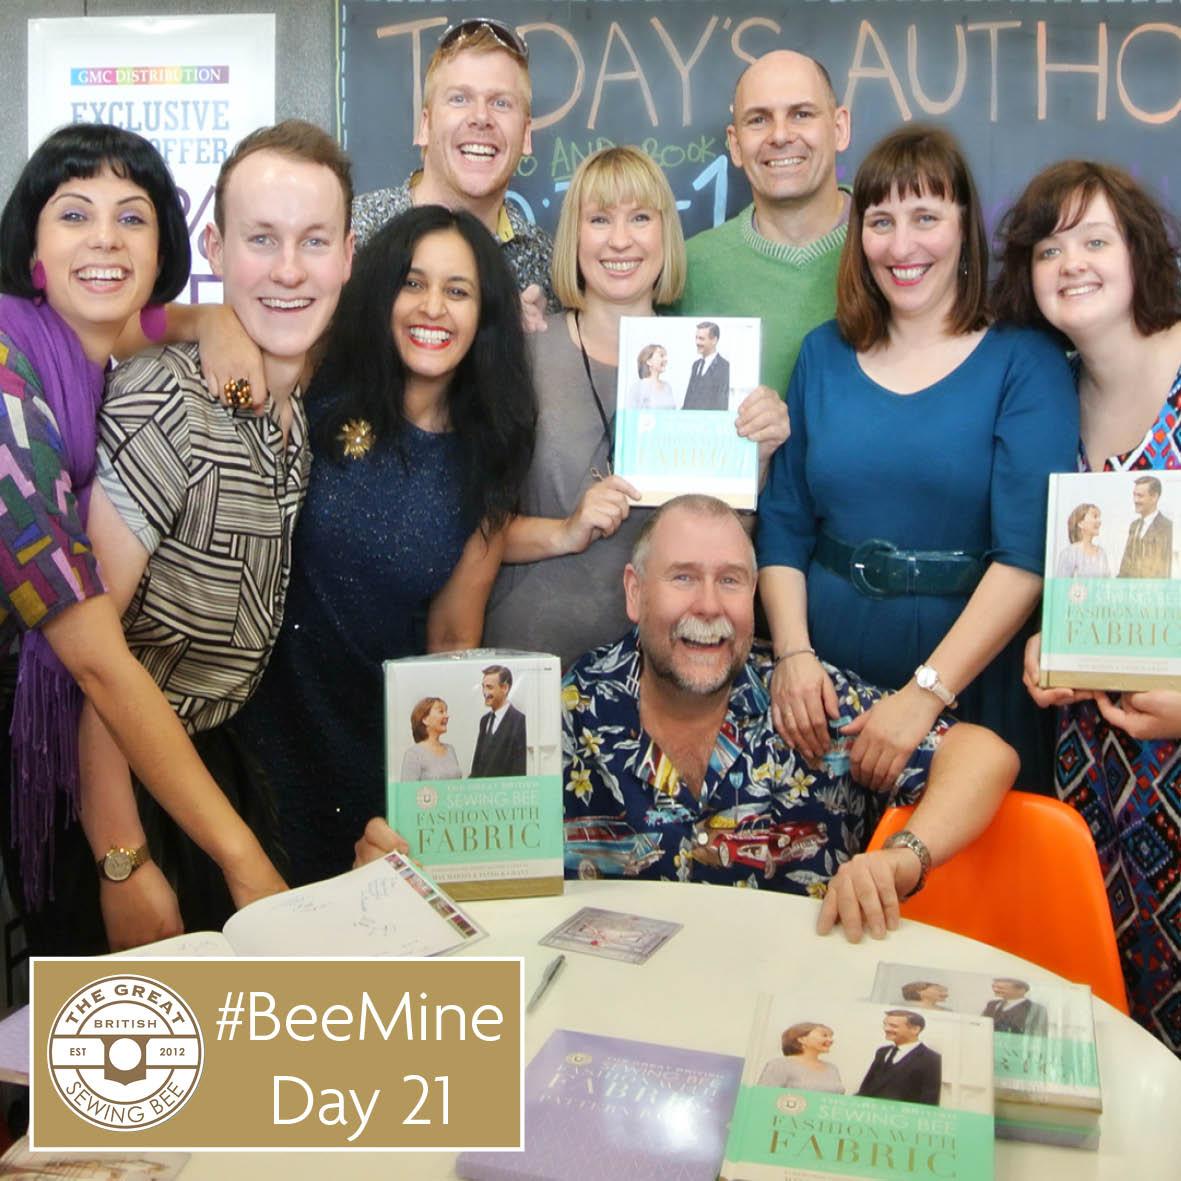 Day 21 #BeeMine- My 30 day blog challenge- Fashion With Fabric